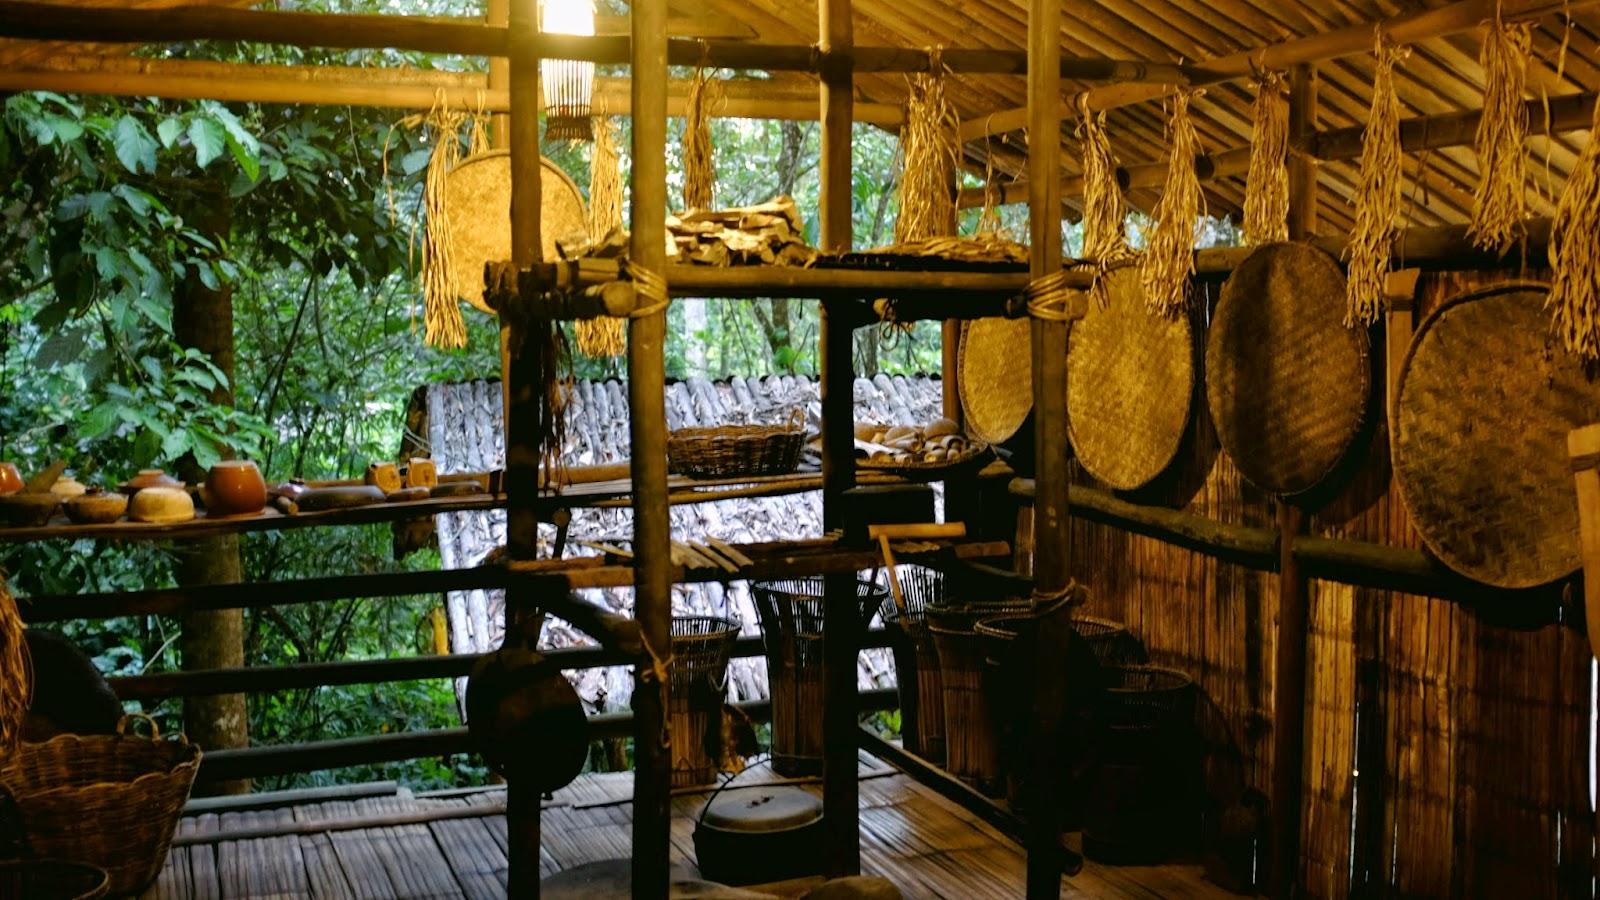 The interior of a Dusun long house at Mari Mari Cultural Village